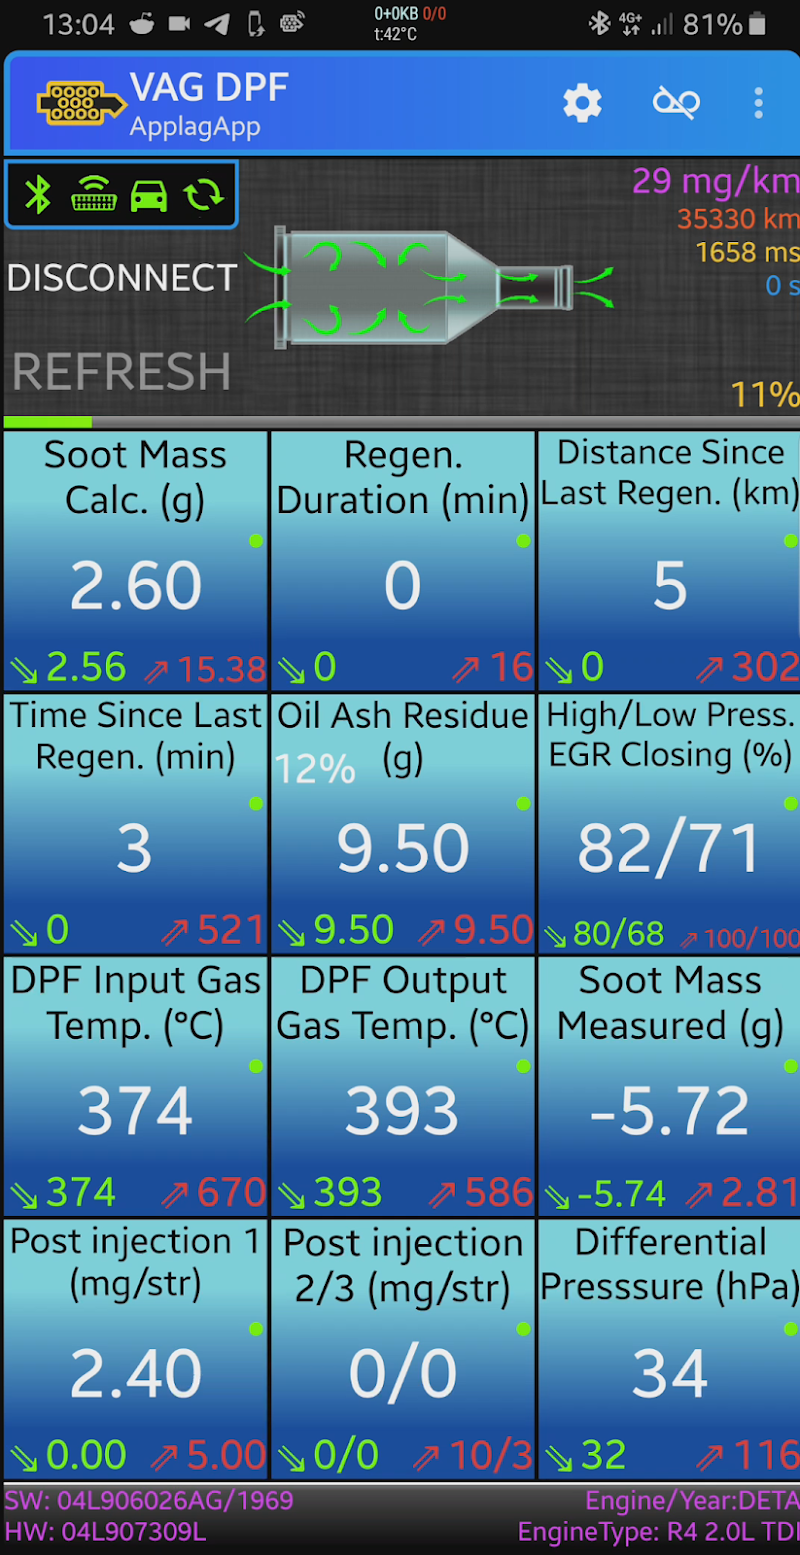 VAG DPF Screenshot 1